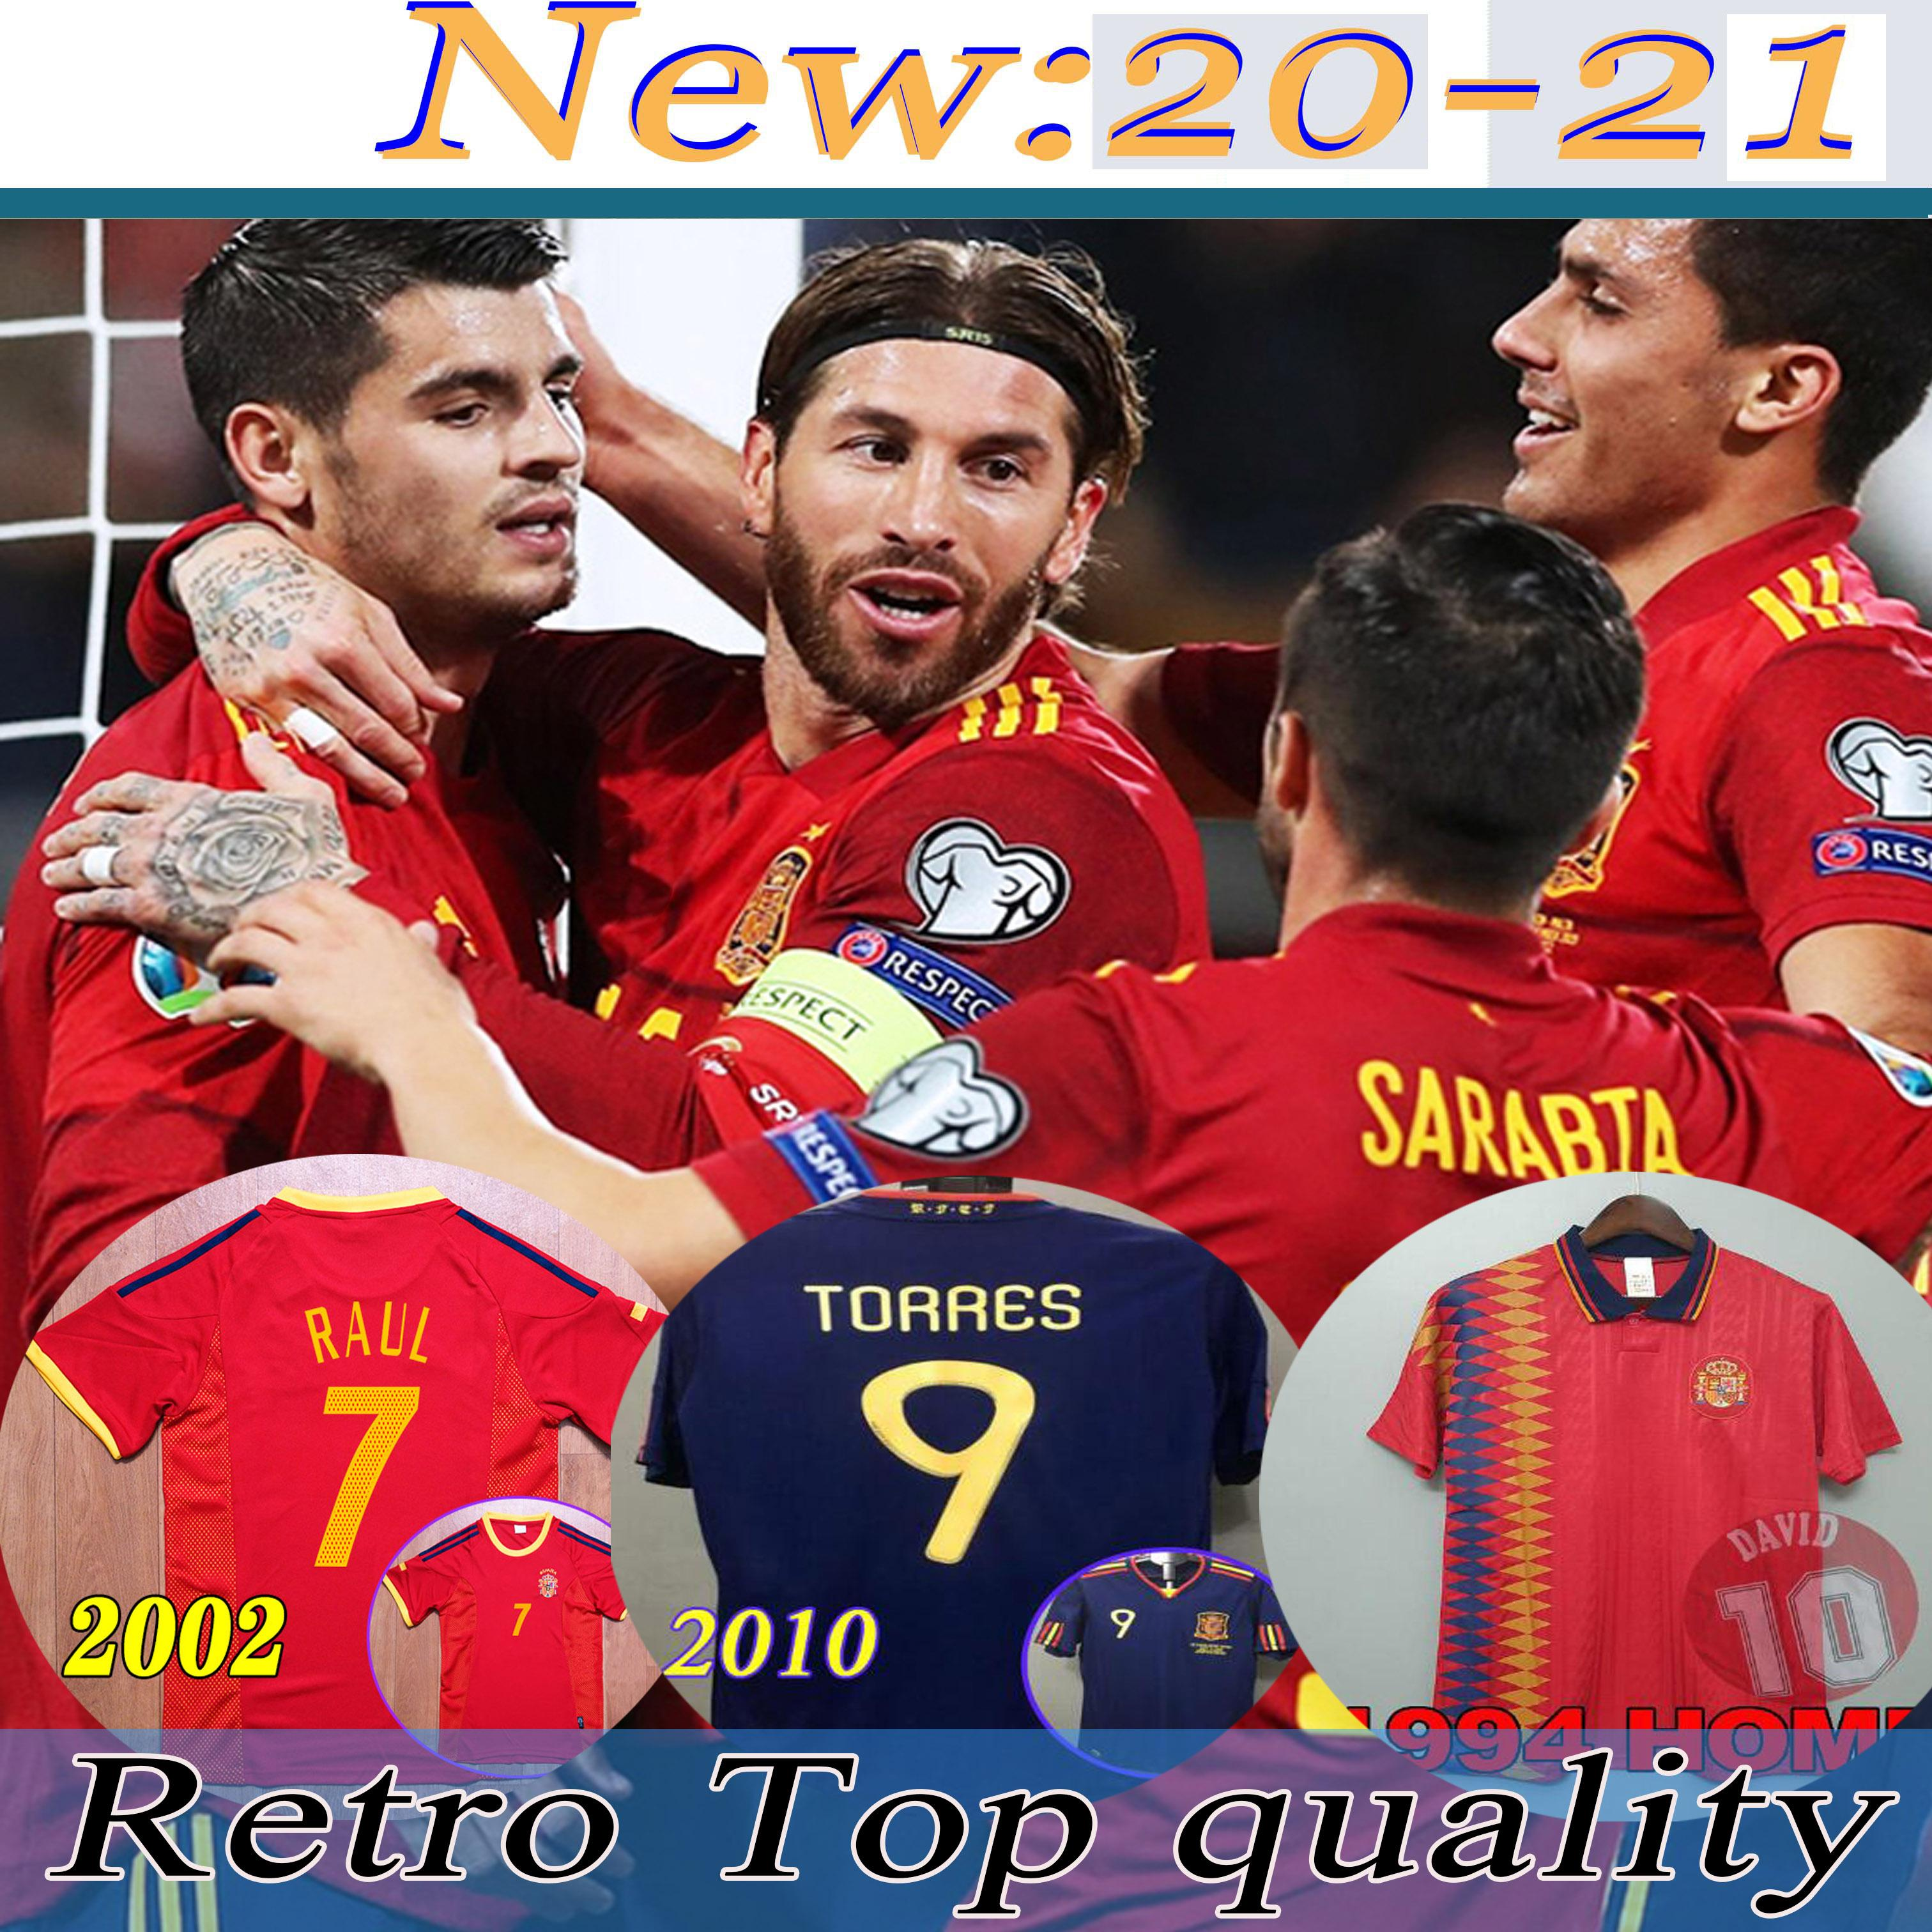 2020 Испания Футбол Джерси Камисета España Paco Morata A.iniesta Pique 1994 2010 Ретро Испания European Cup Alcacer Sergio Alba Men Kids Suit